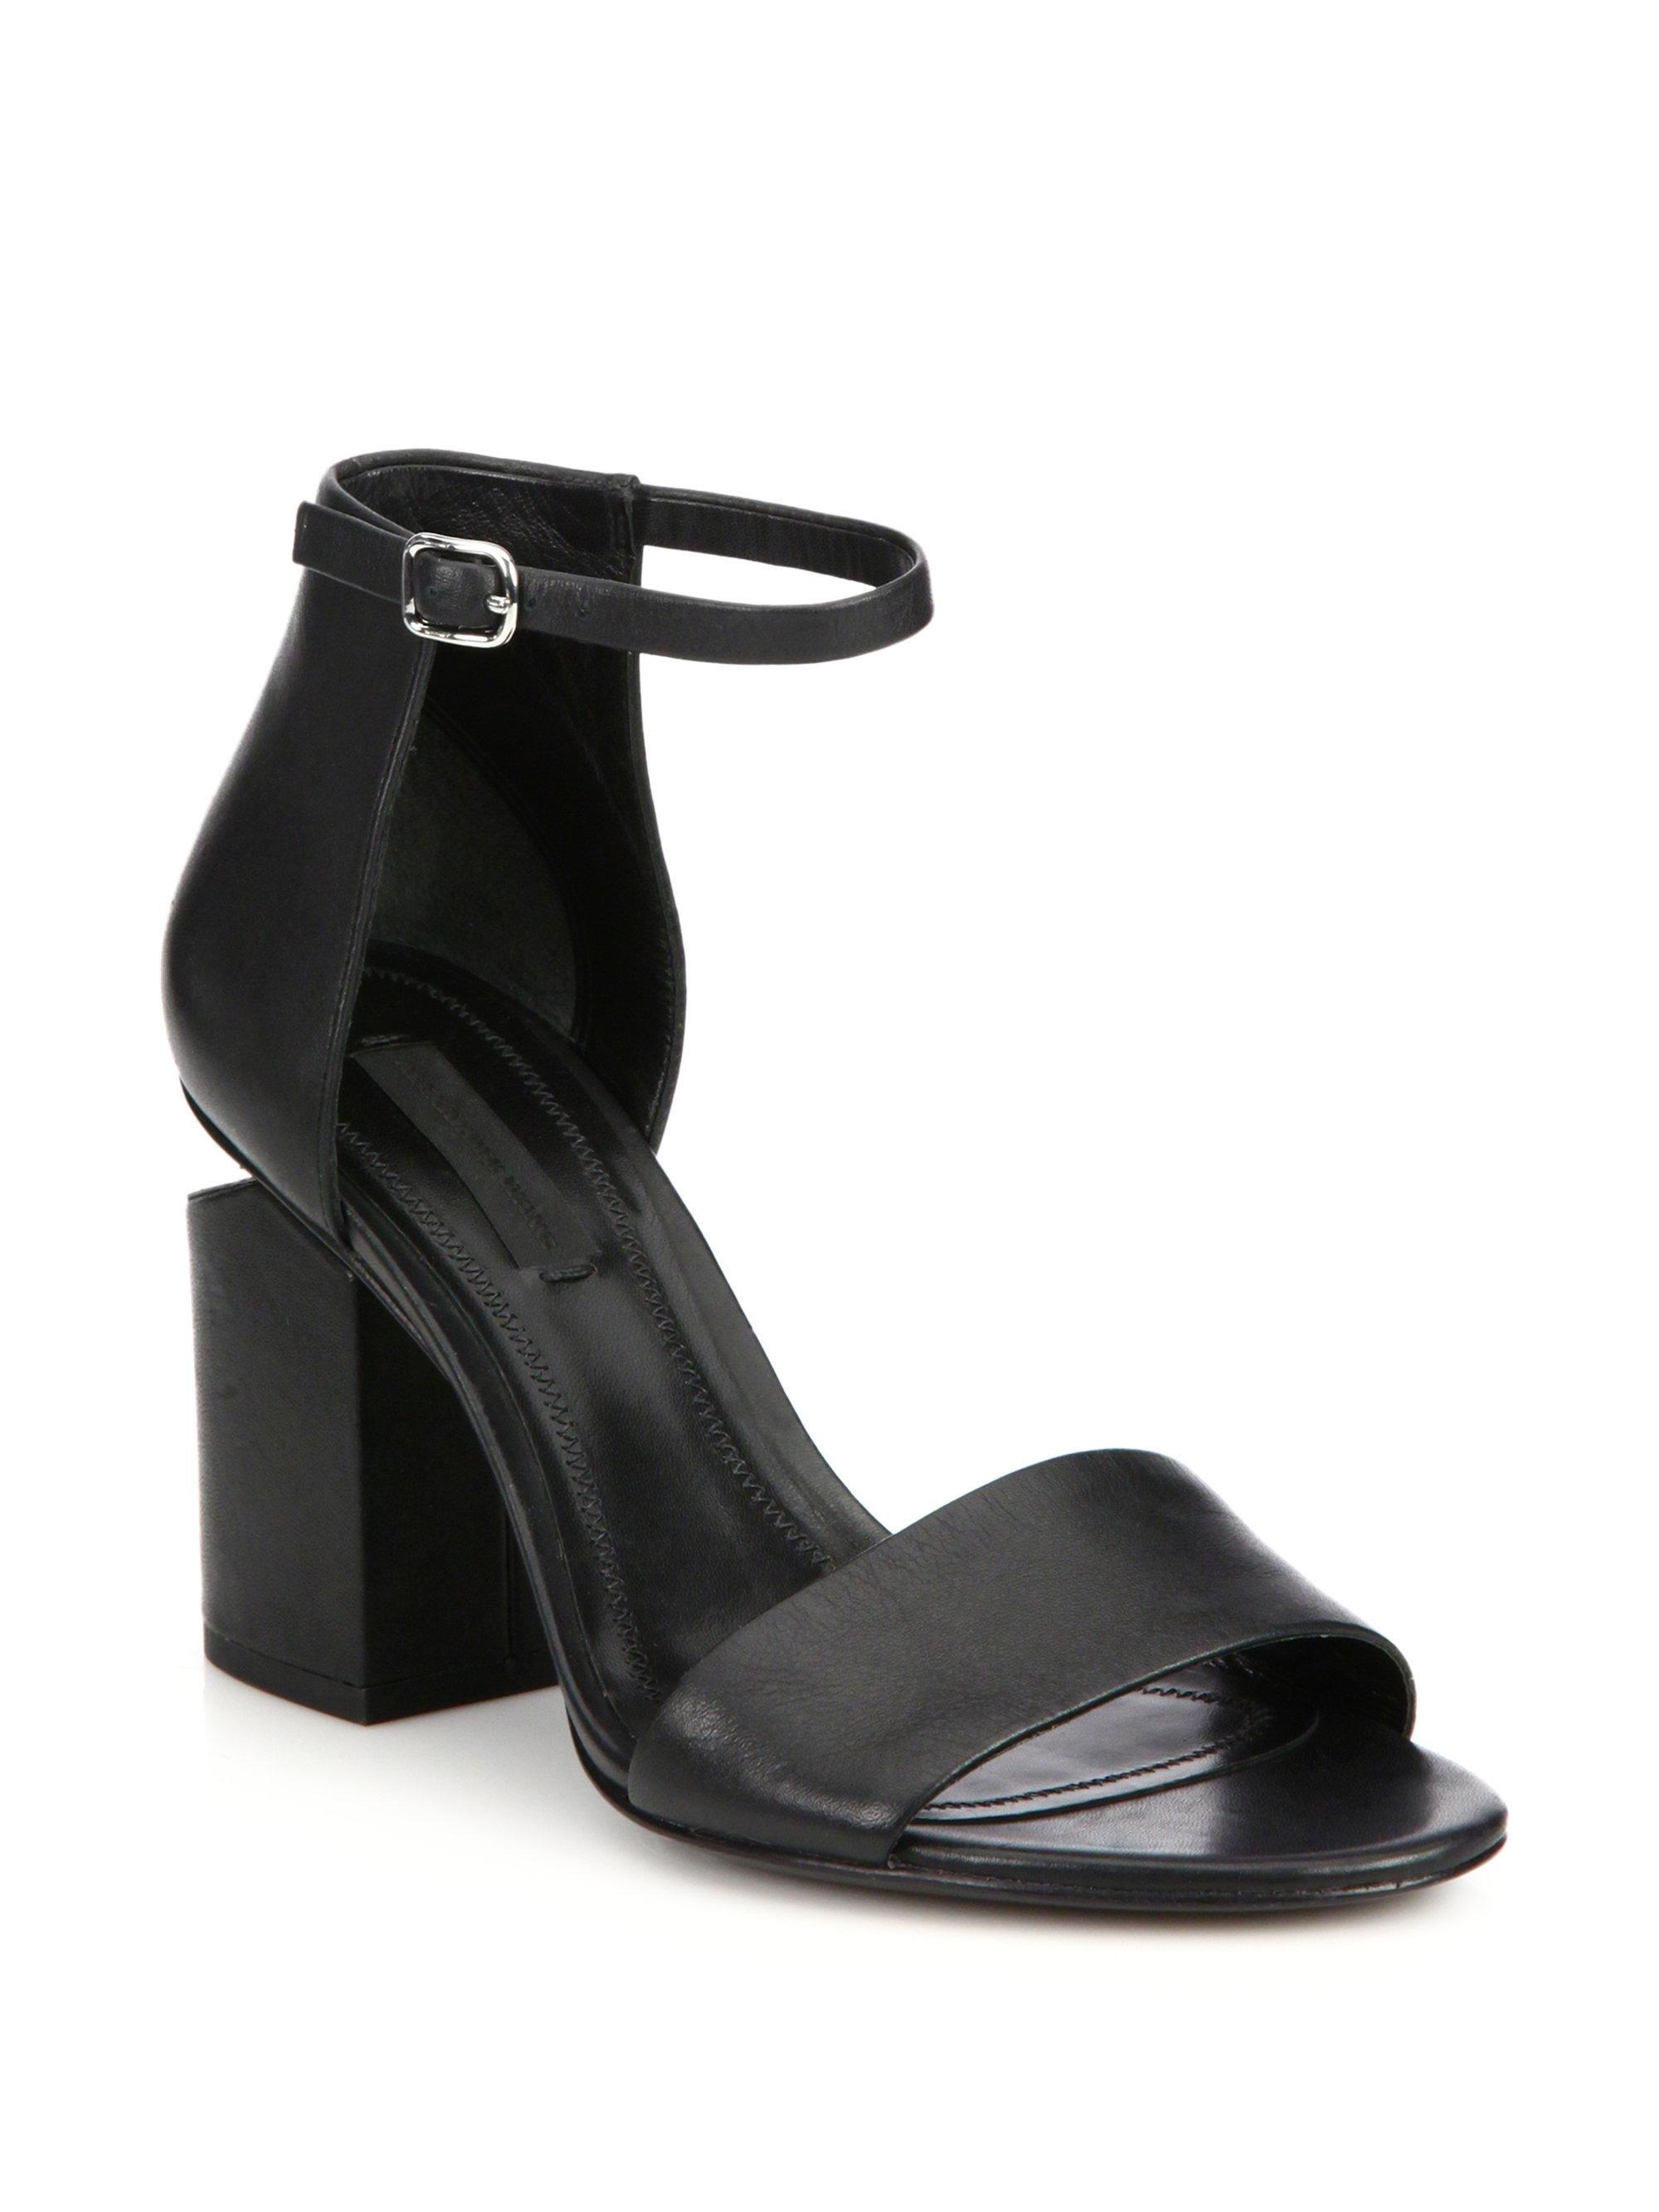 Alexander Wang Abby Tilt-Heel Leather Ankle-Strap Sandals Tj3vA7oFD